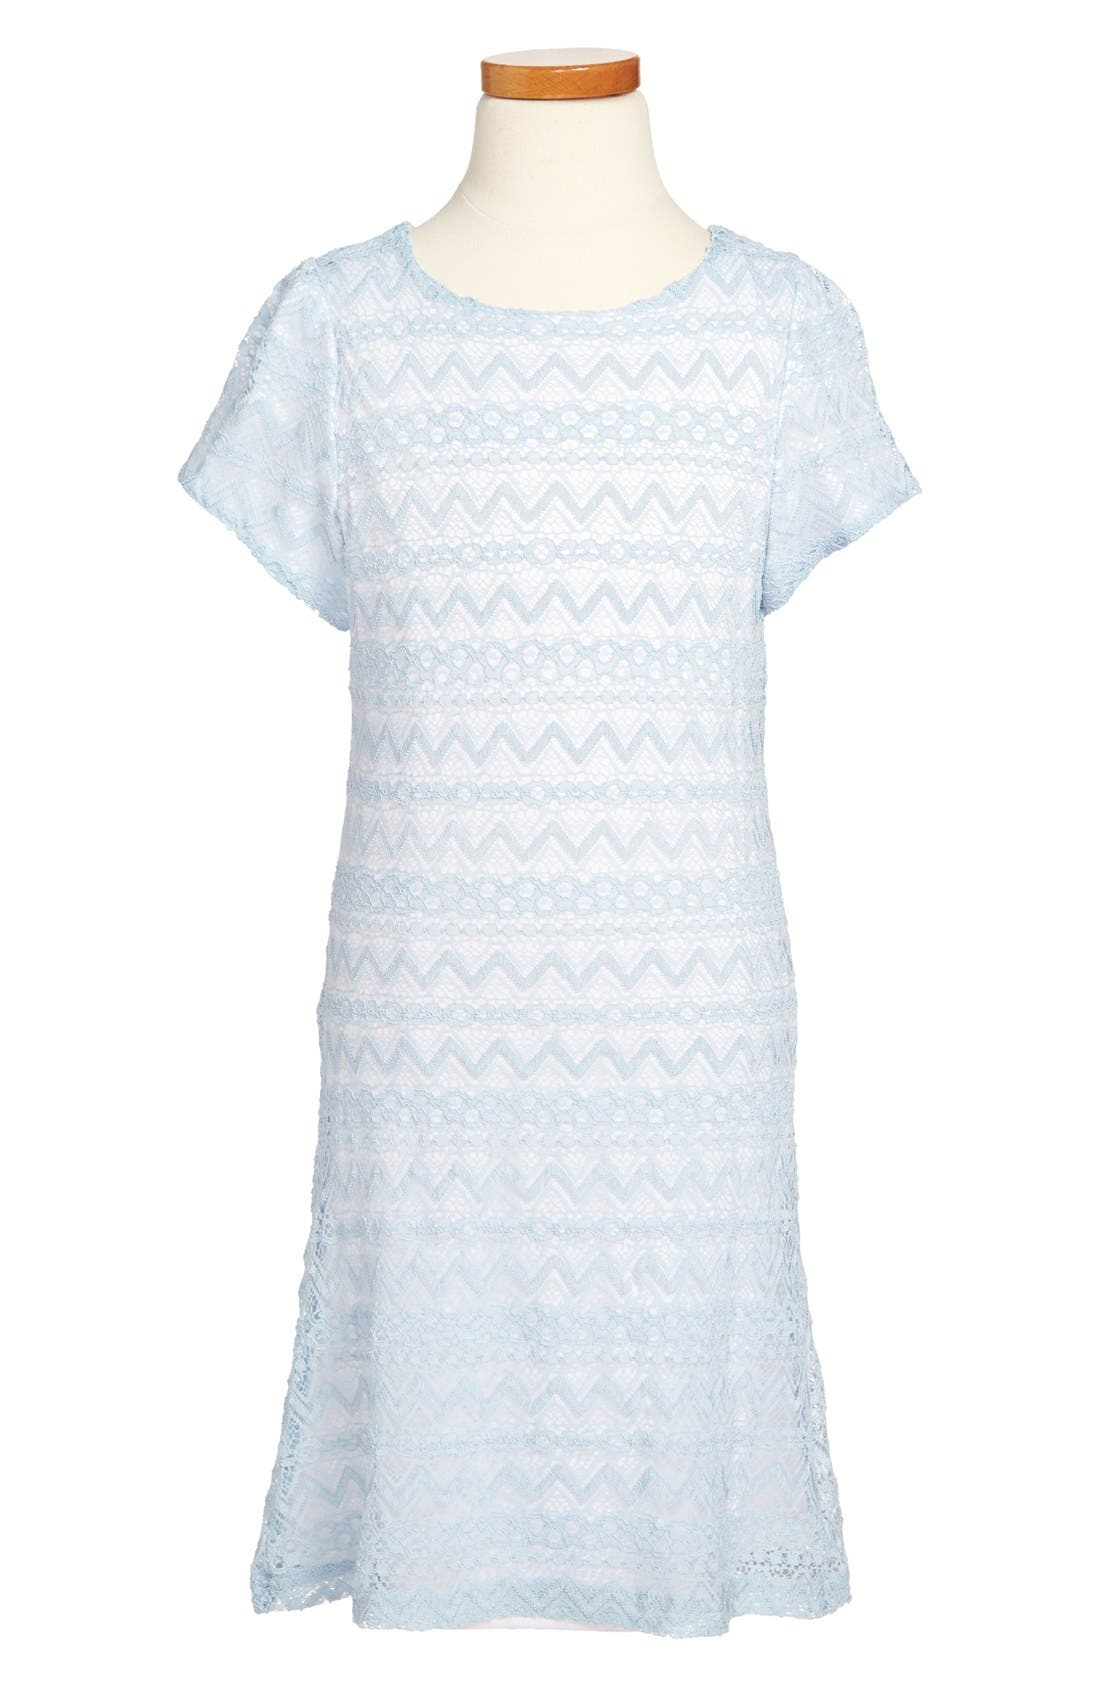 Main Image - Laundry by Shelli Segal 'Lacey' Dress (Big Girls)